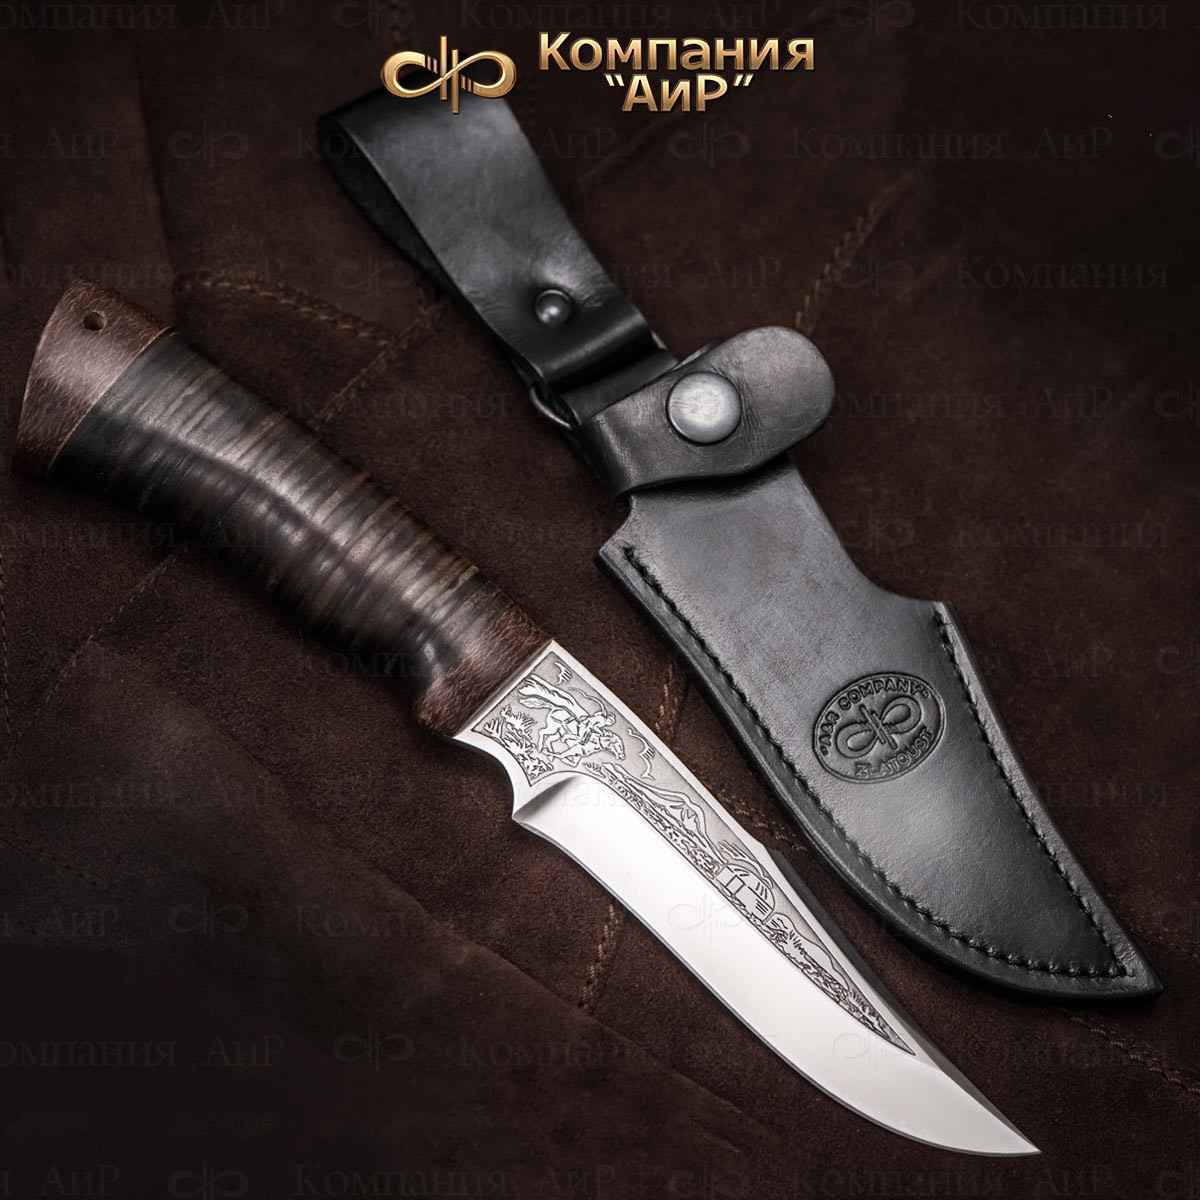 Нож АиР Хазар, сталь 110х18 М-ШД, рукоять кожа